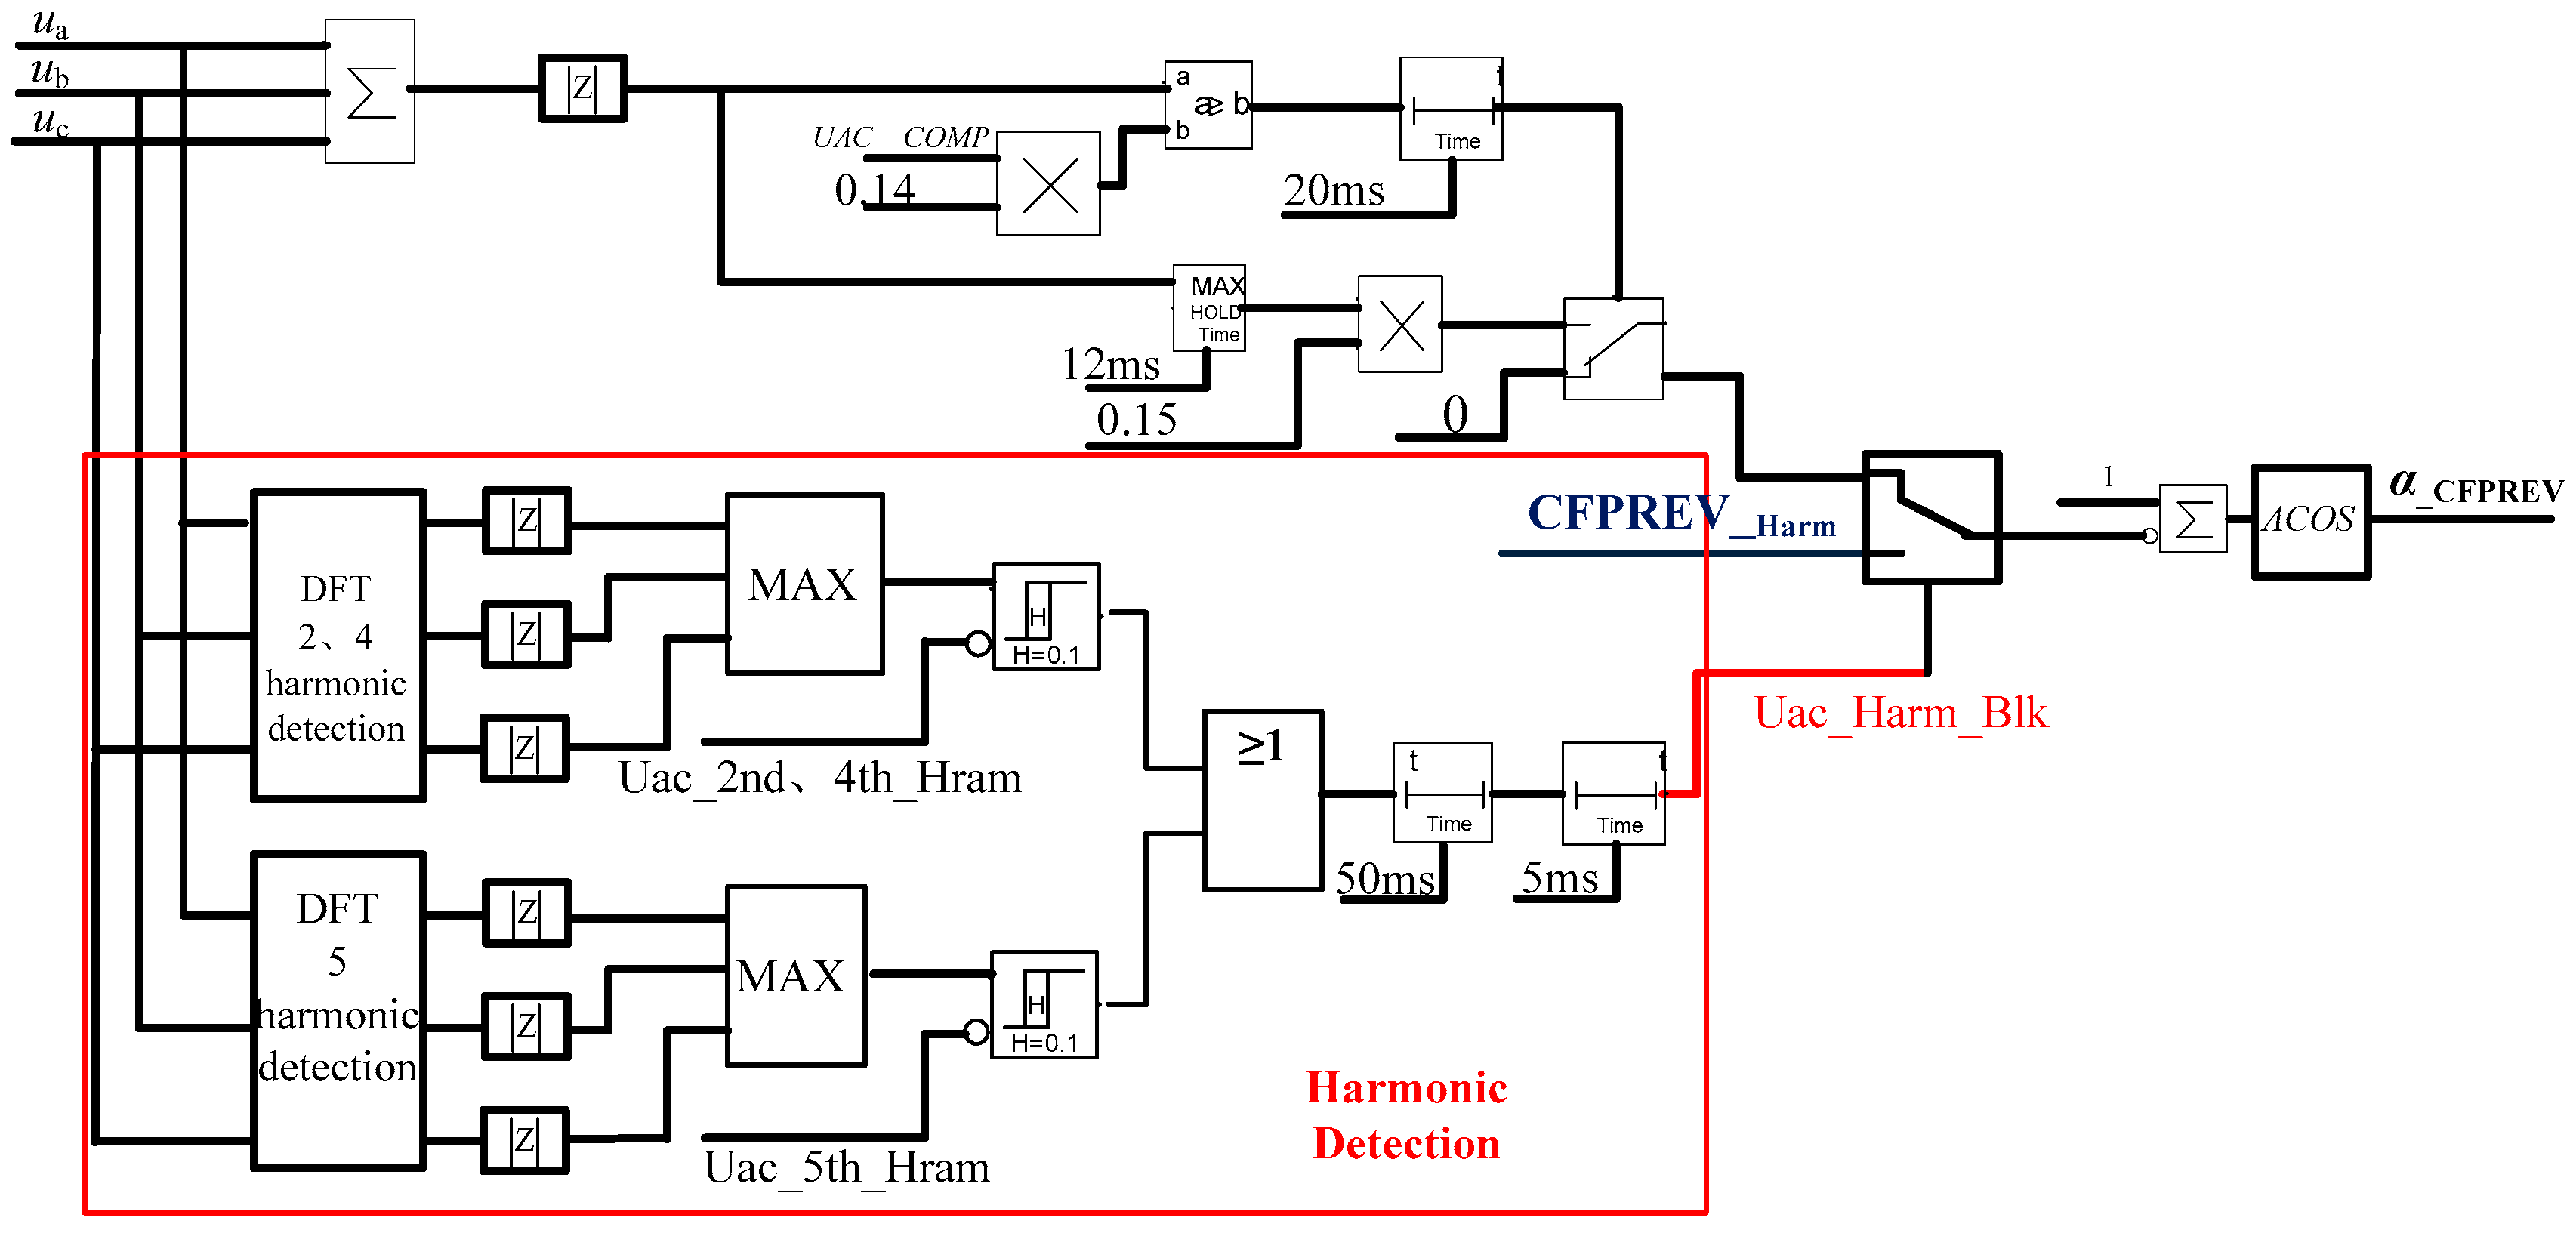 ih 656 wiring diagram cb750f shop manual wiring diagram 2000 honda Snatch Block Diagrams  SunSun HW- 304B Internet of Things Diagrams Wiring a Homeline Service Panel